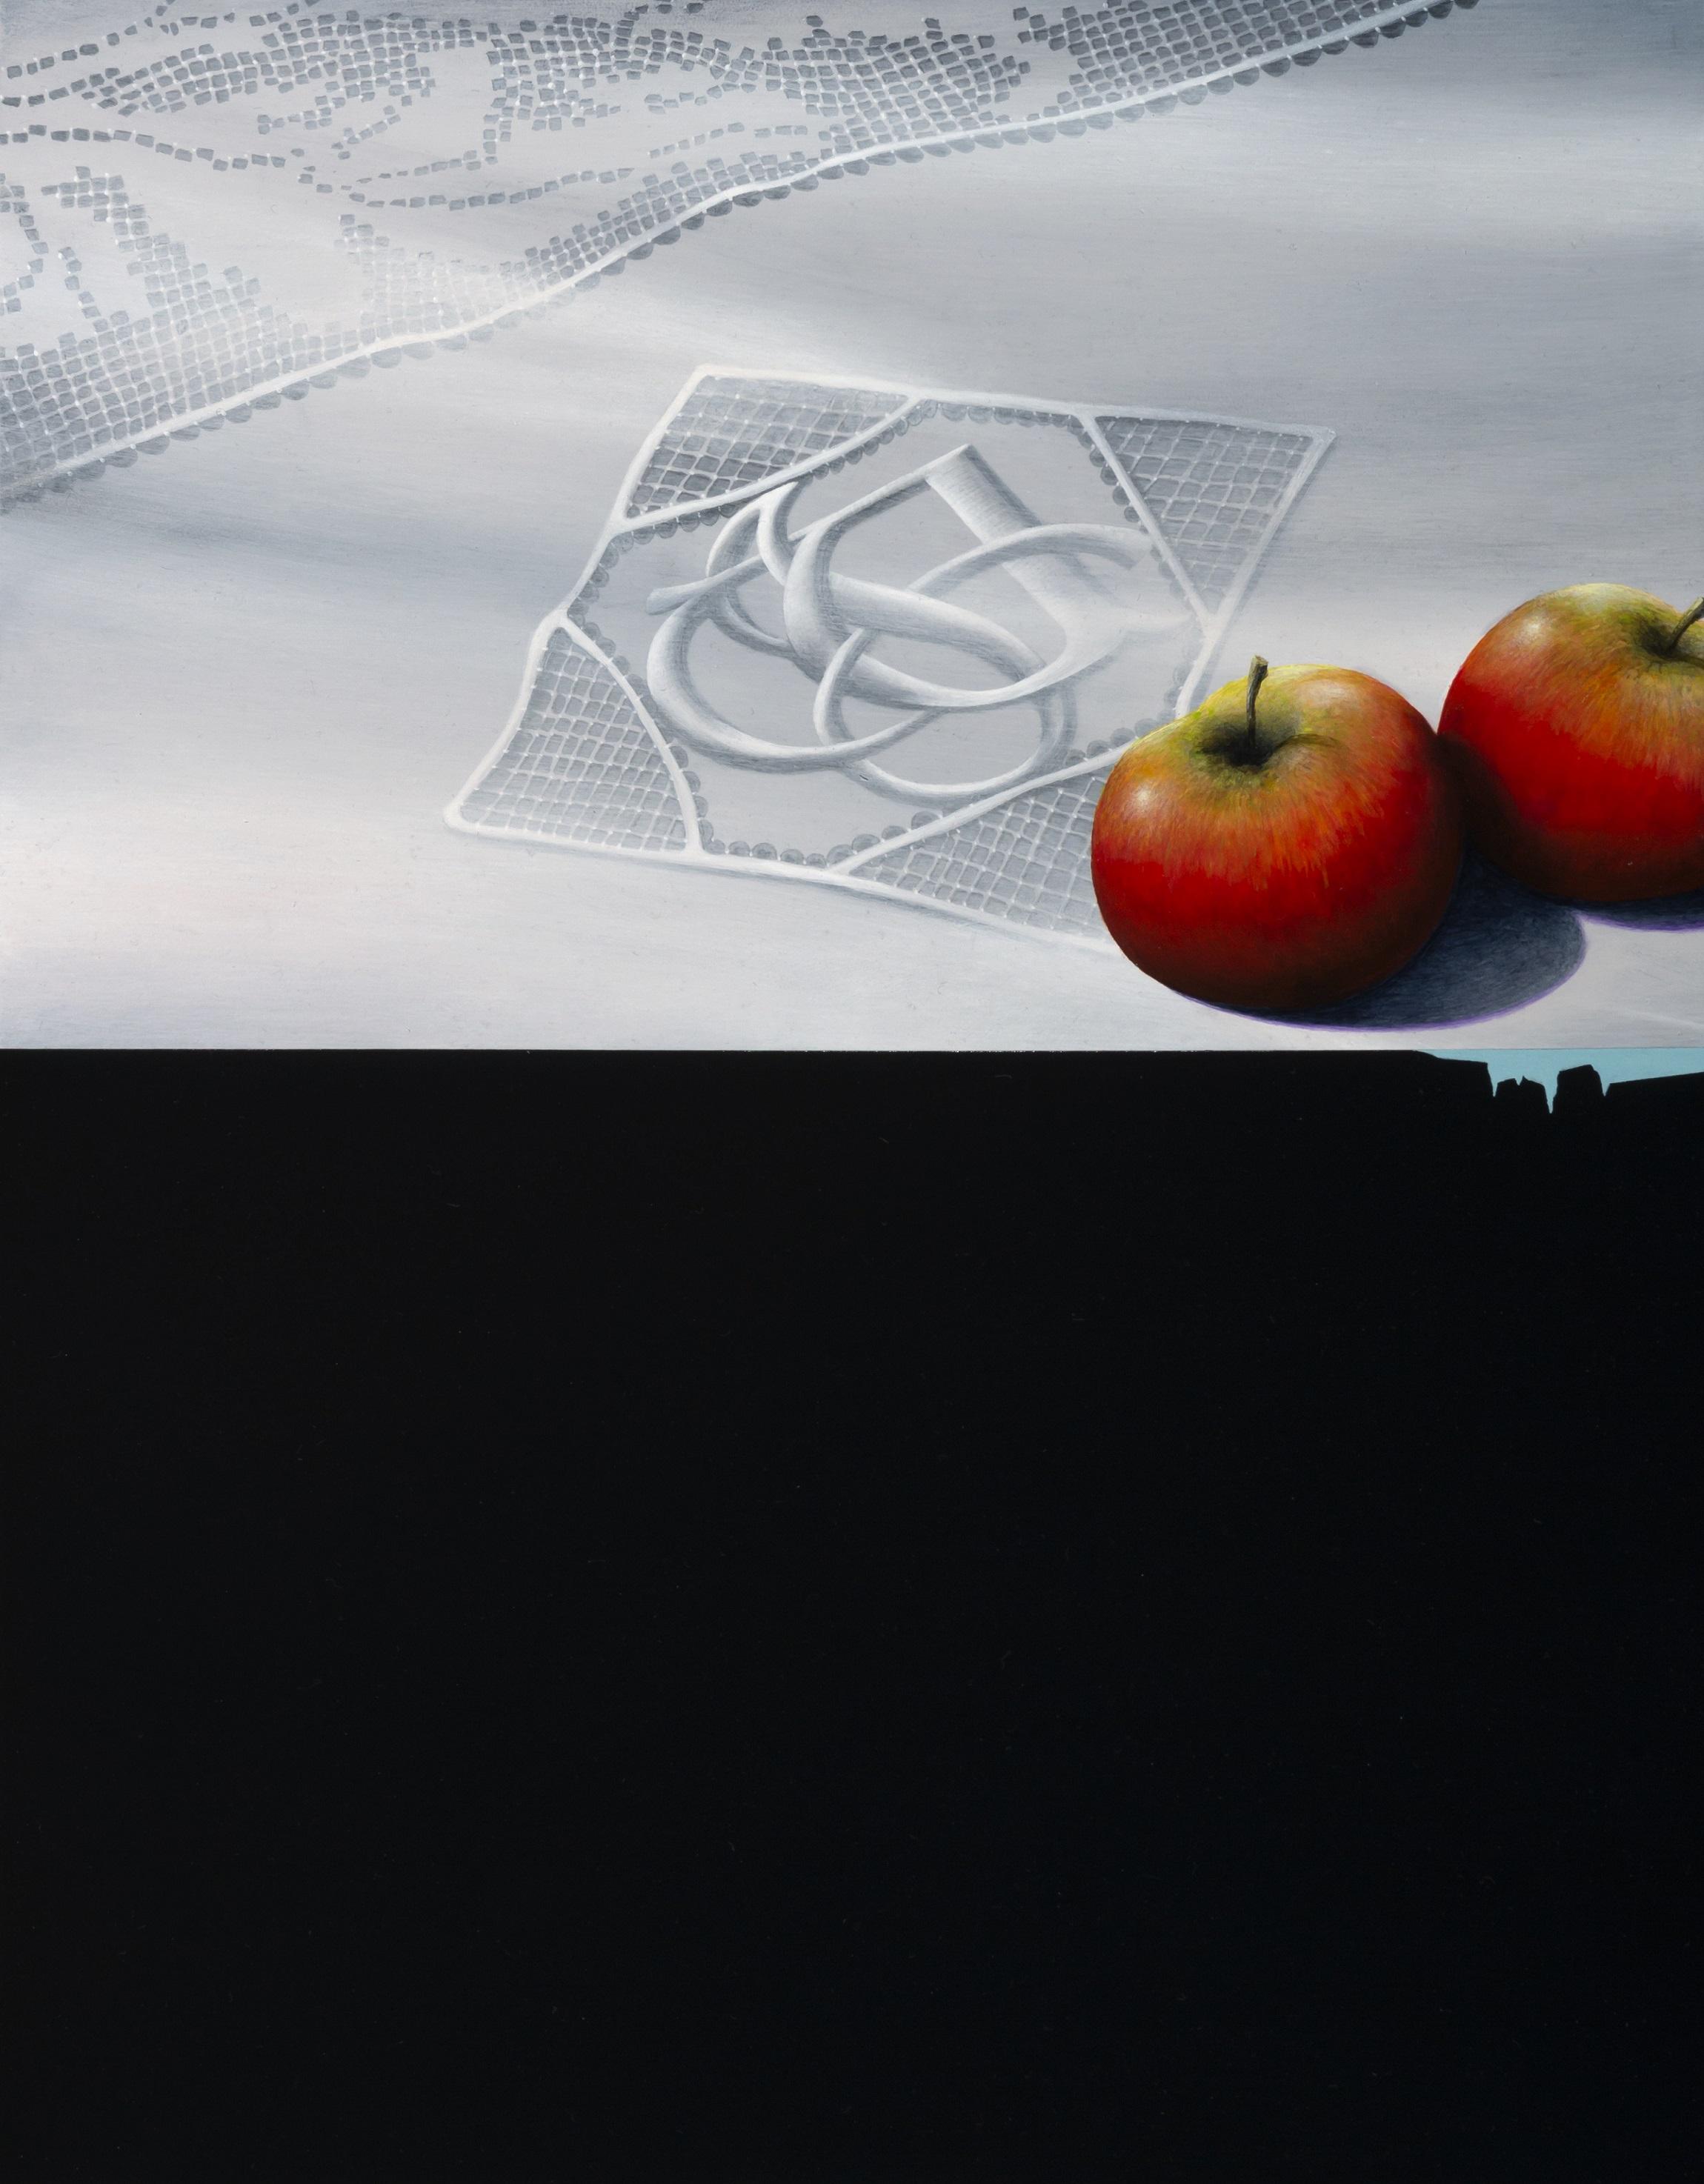 Jarek Wojcik, Spaces and Things 01 , 2015, acrylic on clayboard, 45 x 35cm